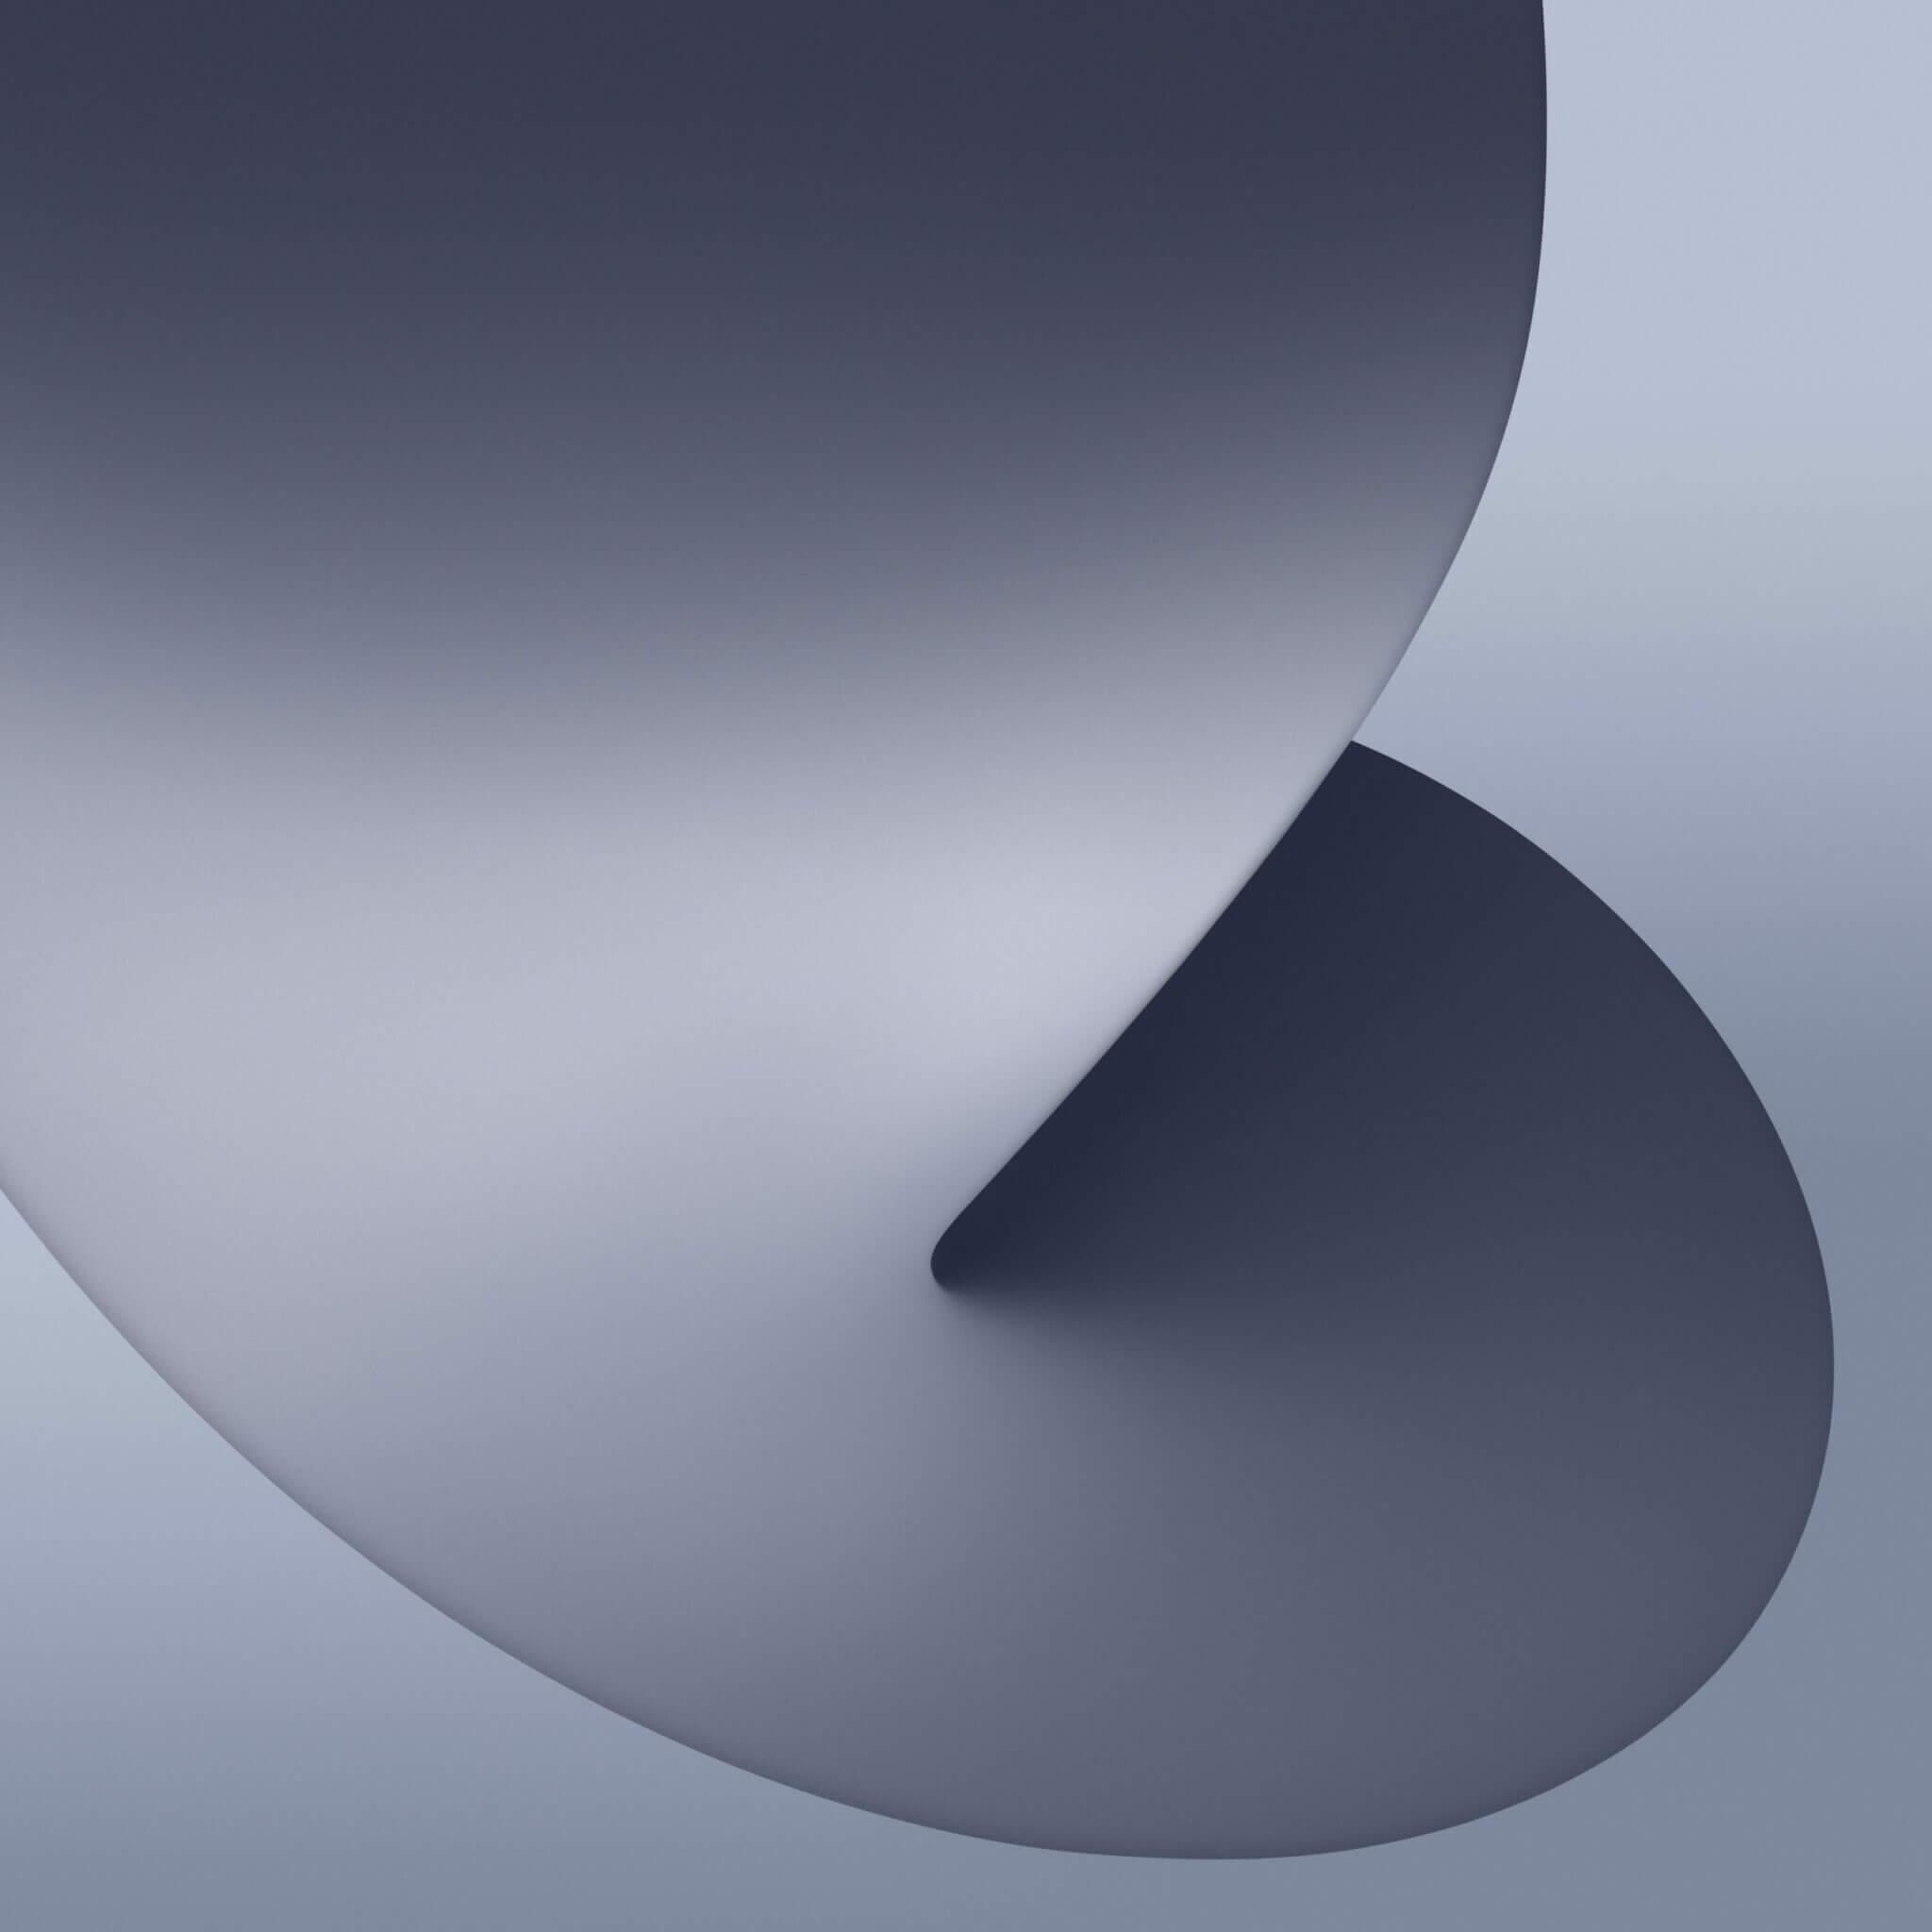 ios 14 wallpaper ispazio light mode 3